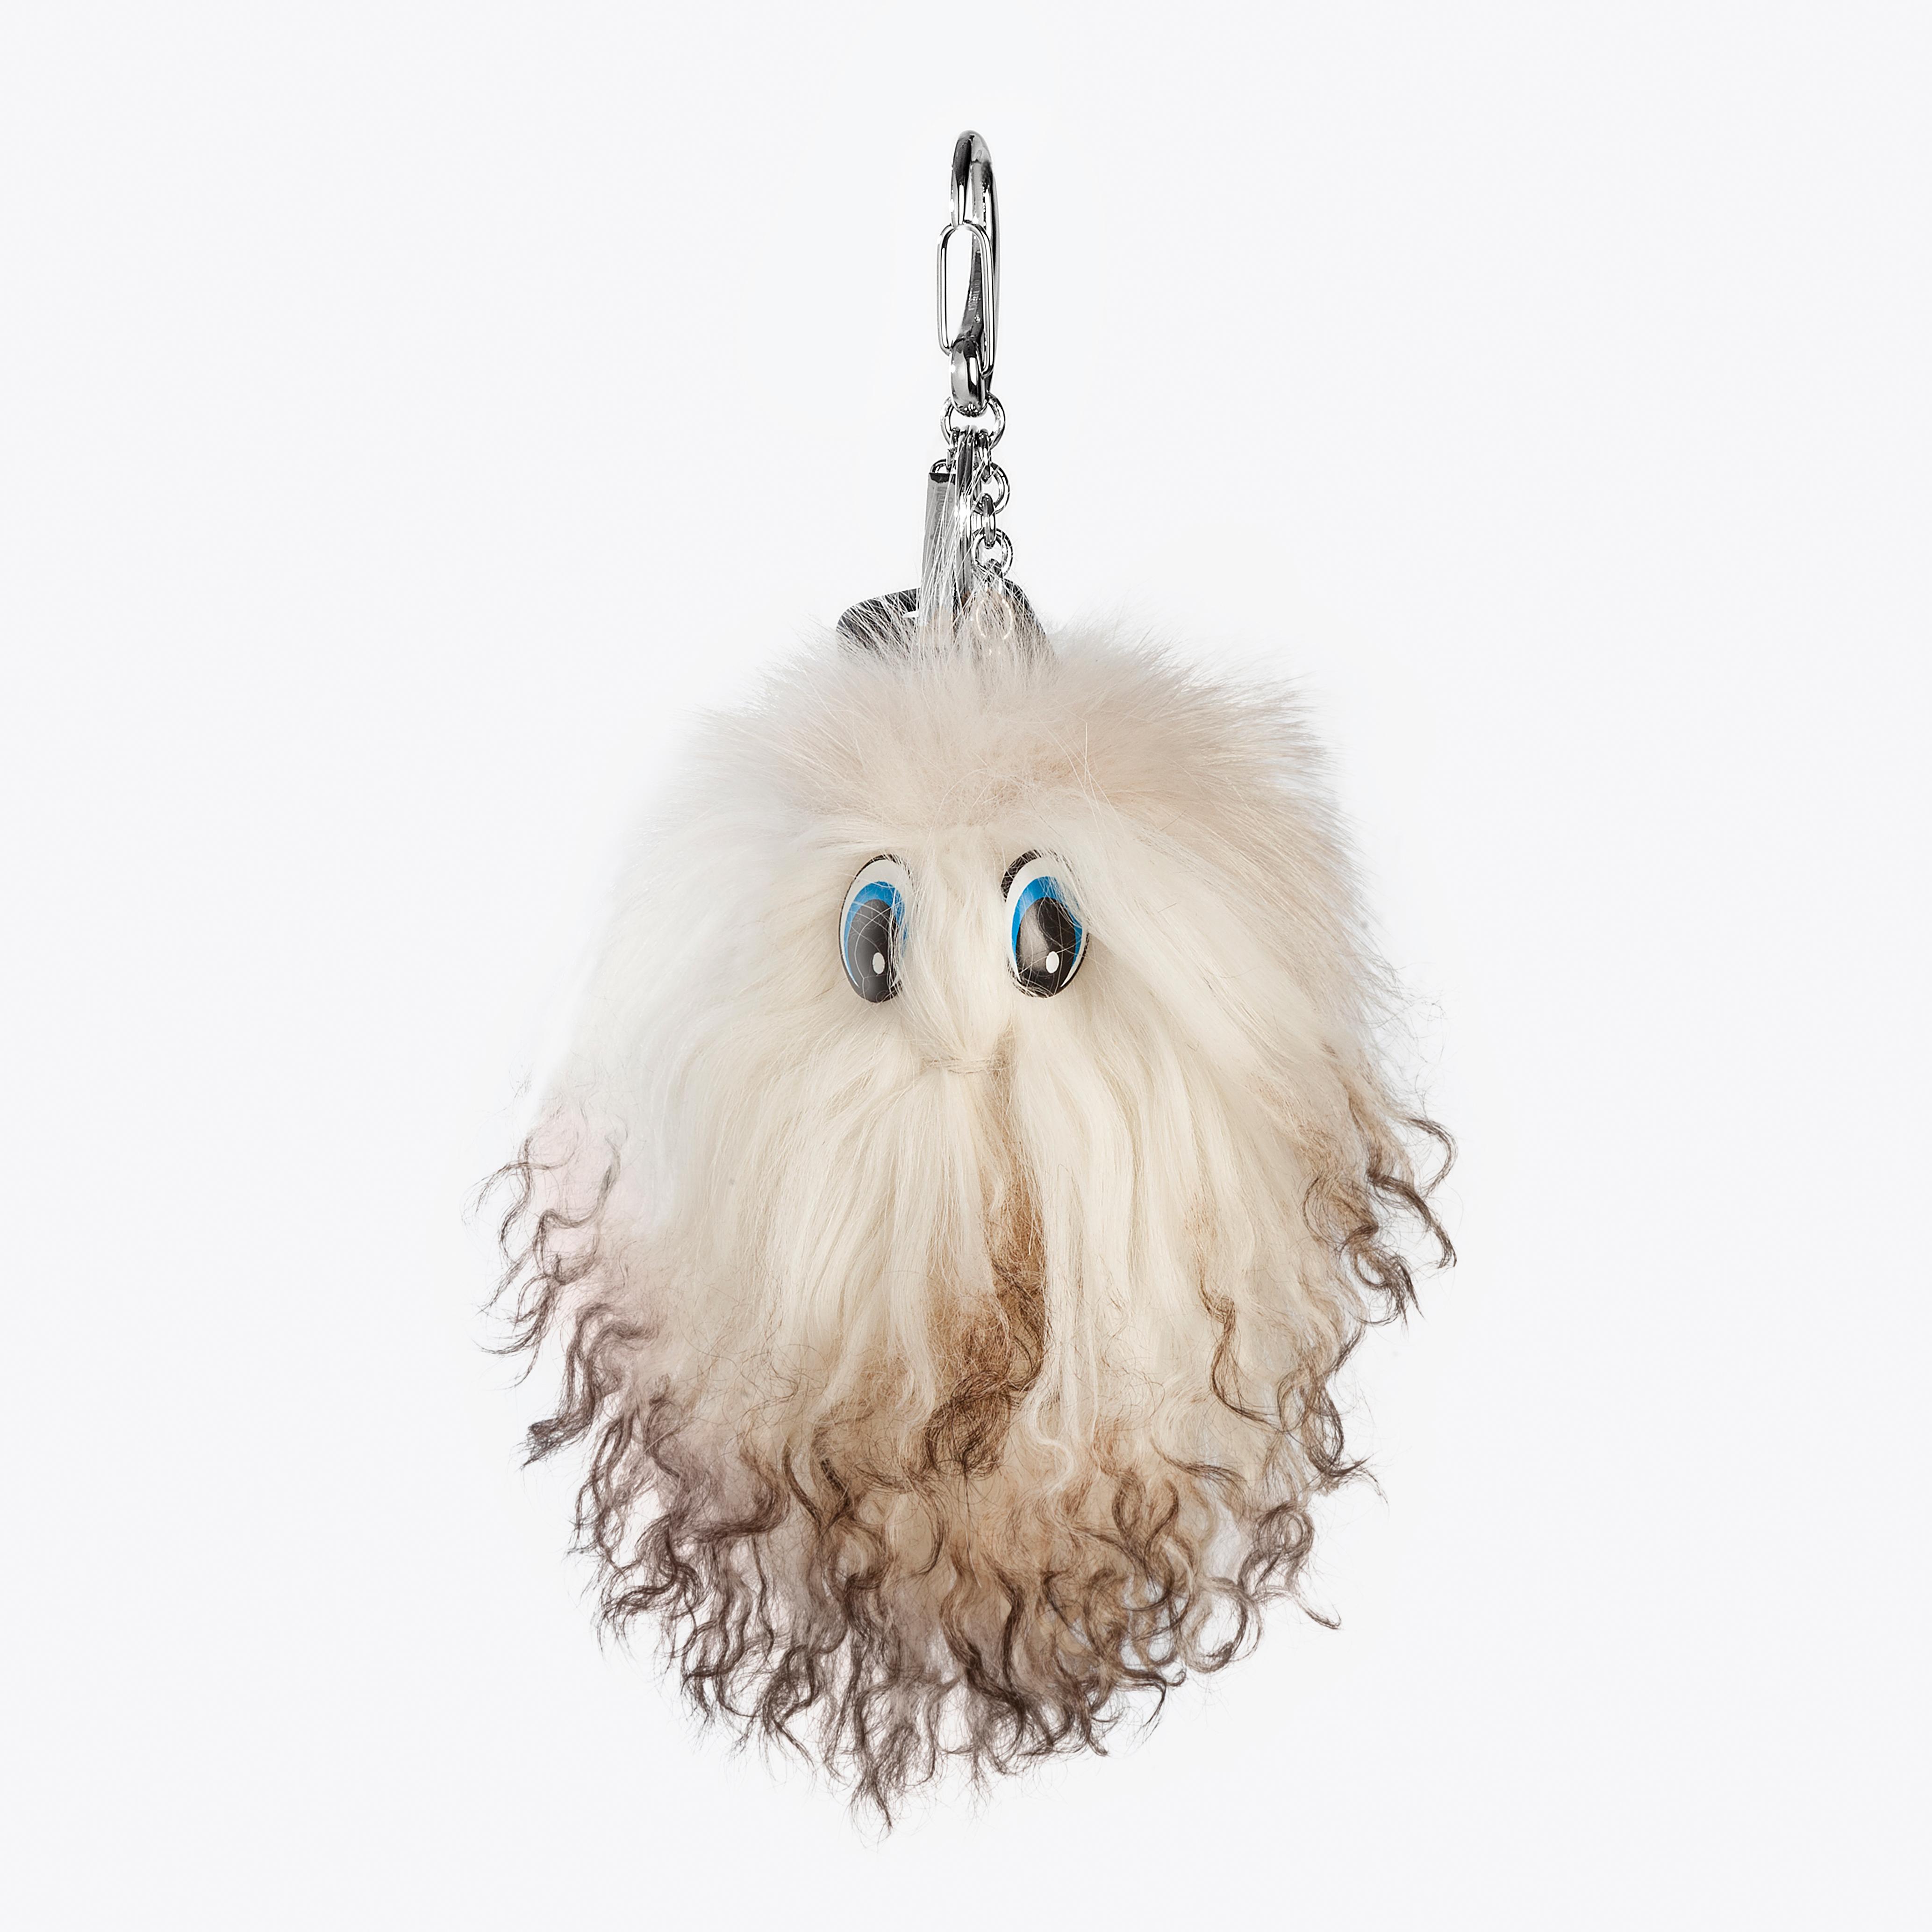 Portachiavi pelliccia volpe bianca pon pon charms borsa disney | Nicola Pelliccerie